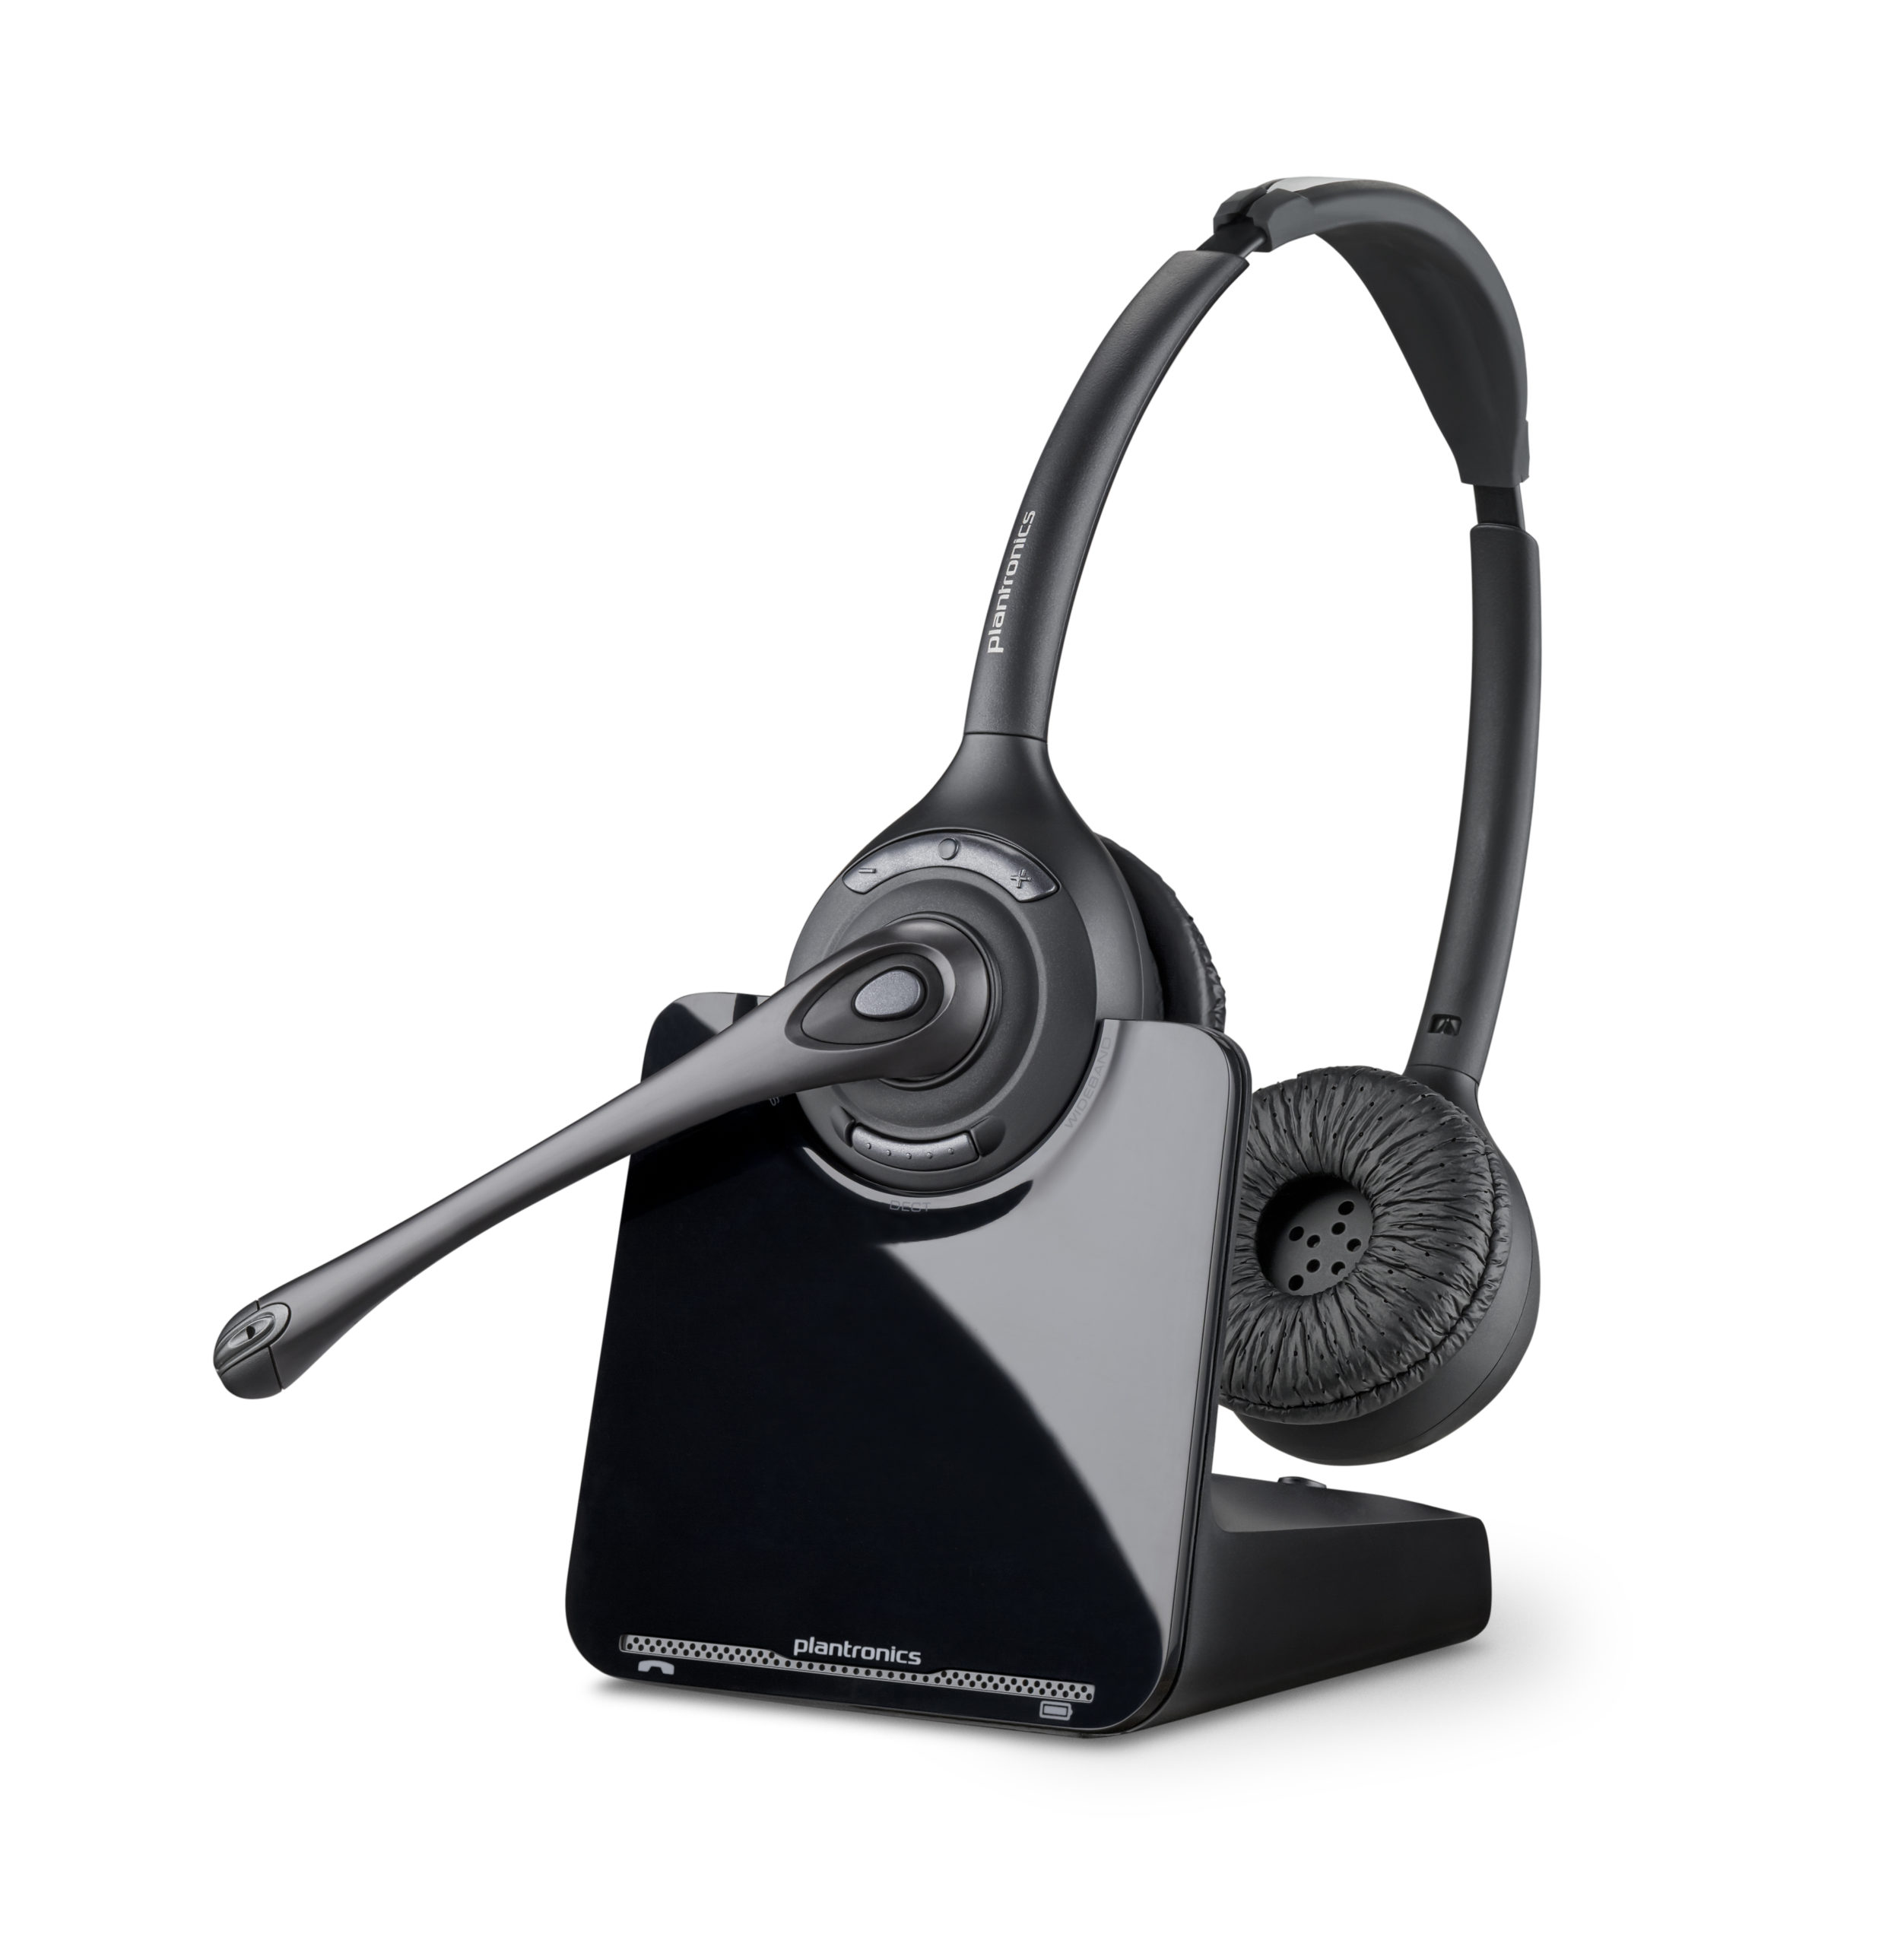 Plantronics CS520 Binaural DECT Cordless Headset - Refurbished